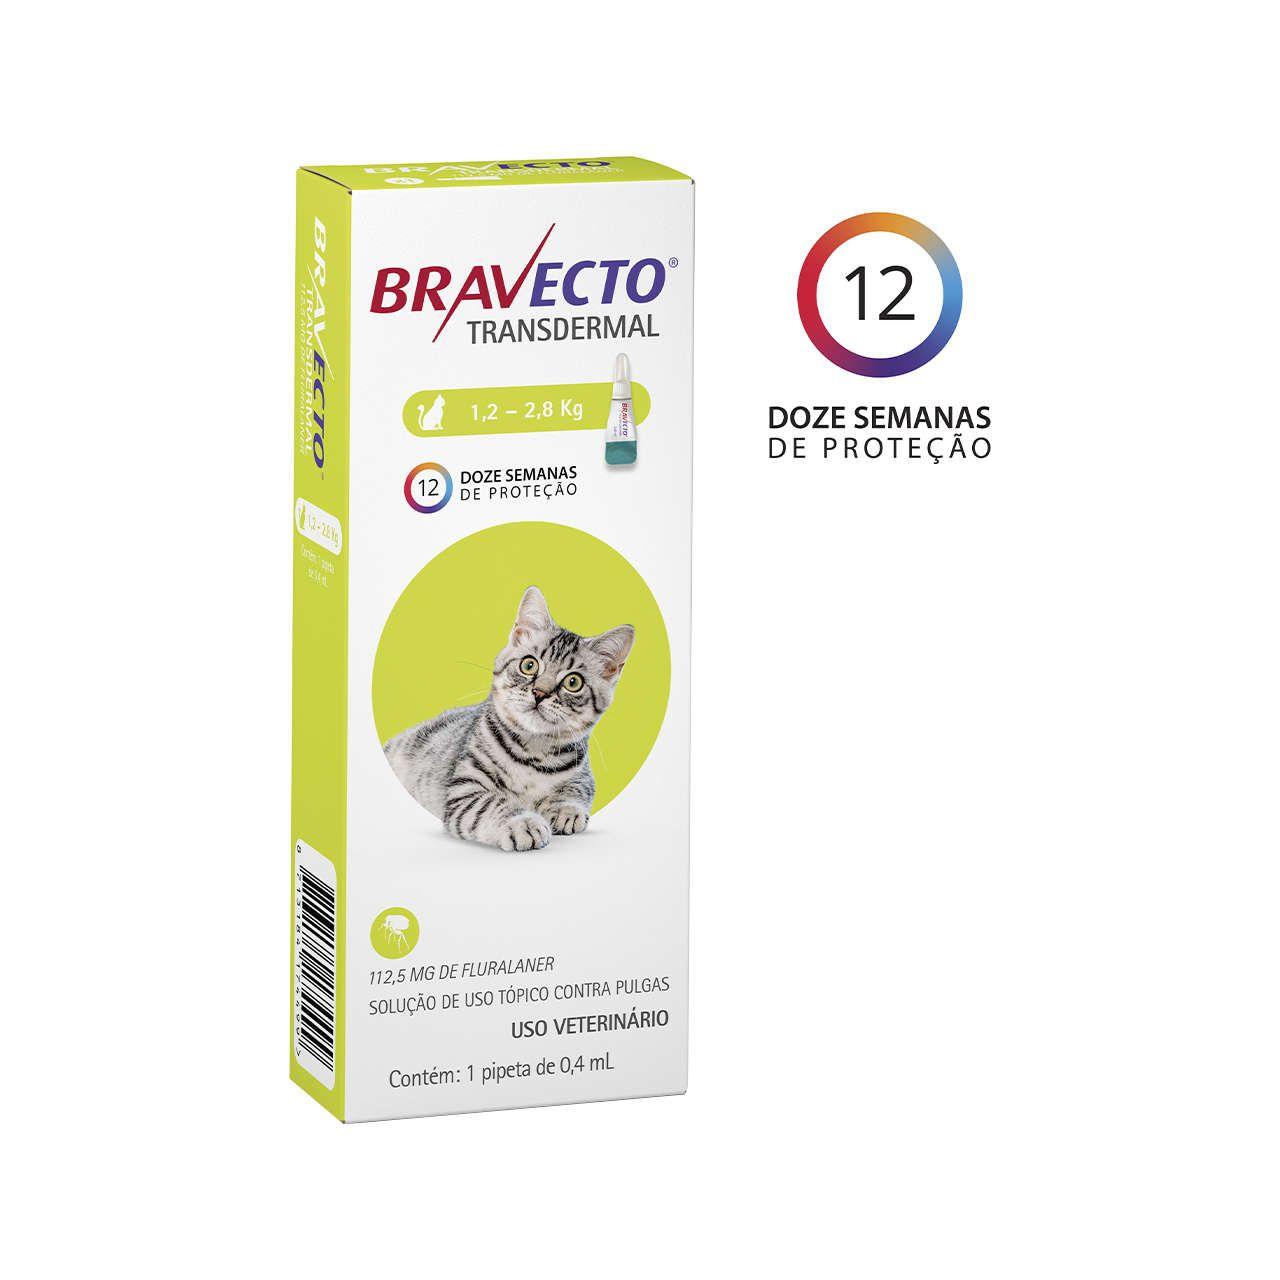 ANTIPULGAS BRAVECTO TRANSDERMAL PARA GATOS DE 1,2 A 2,8KG